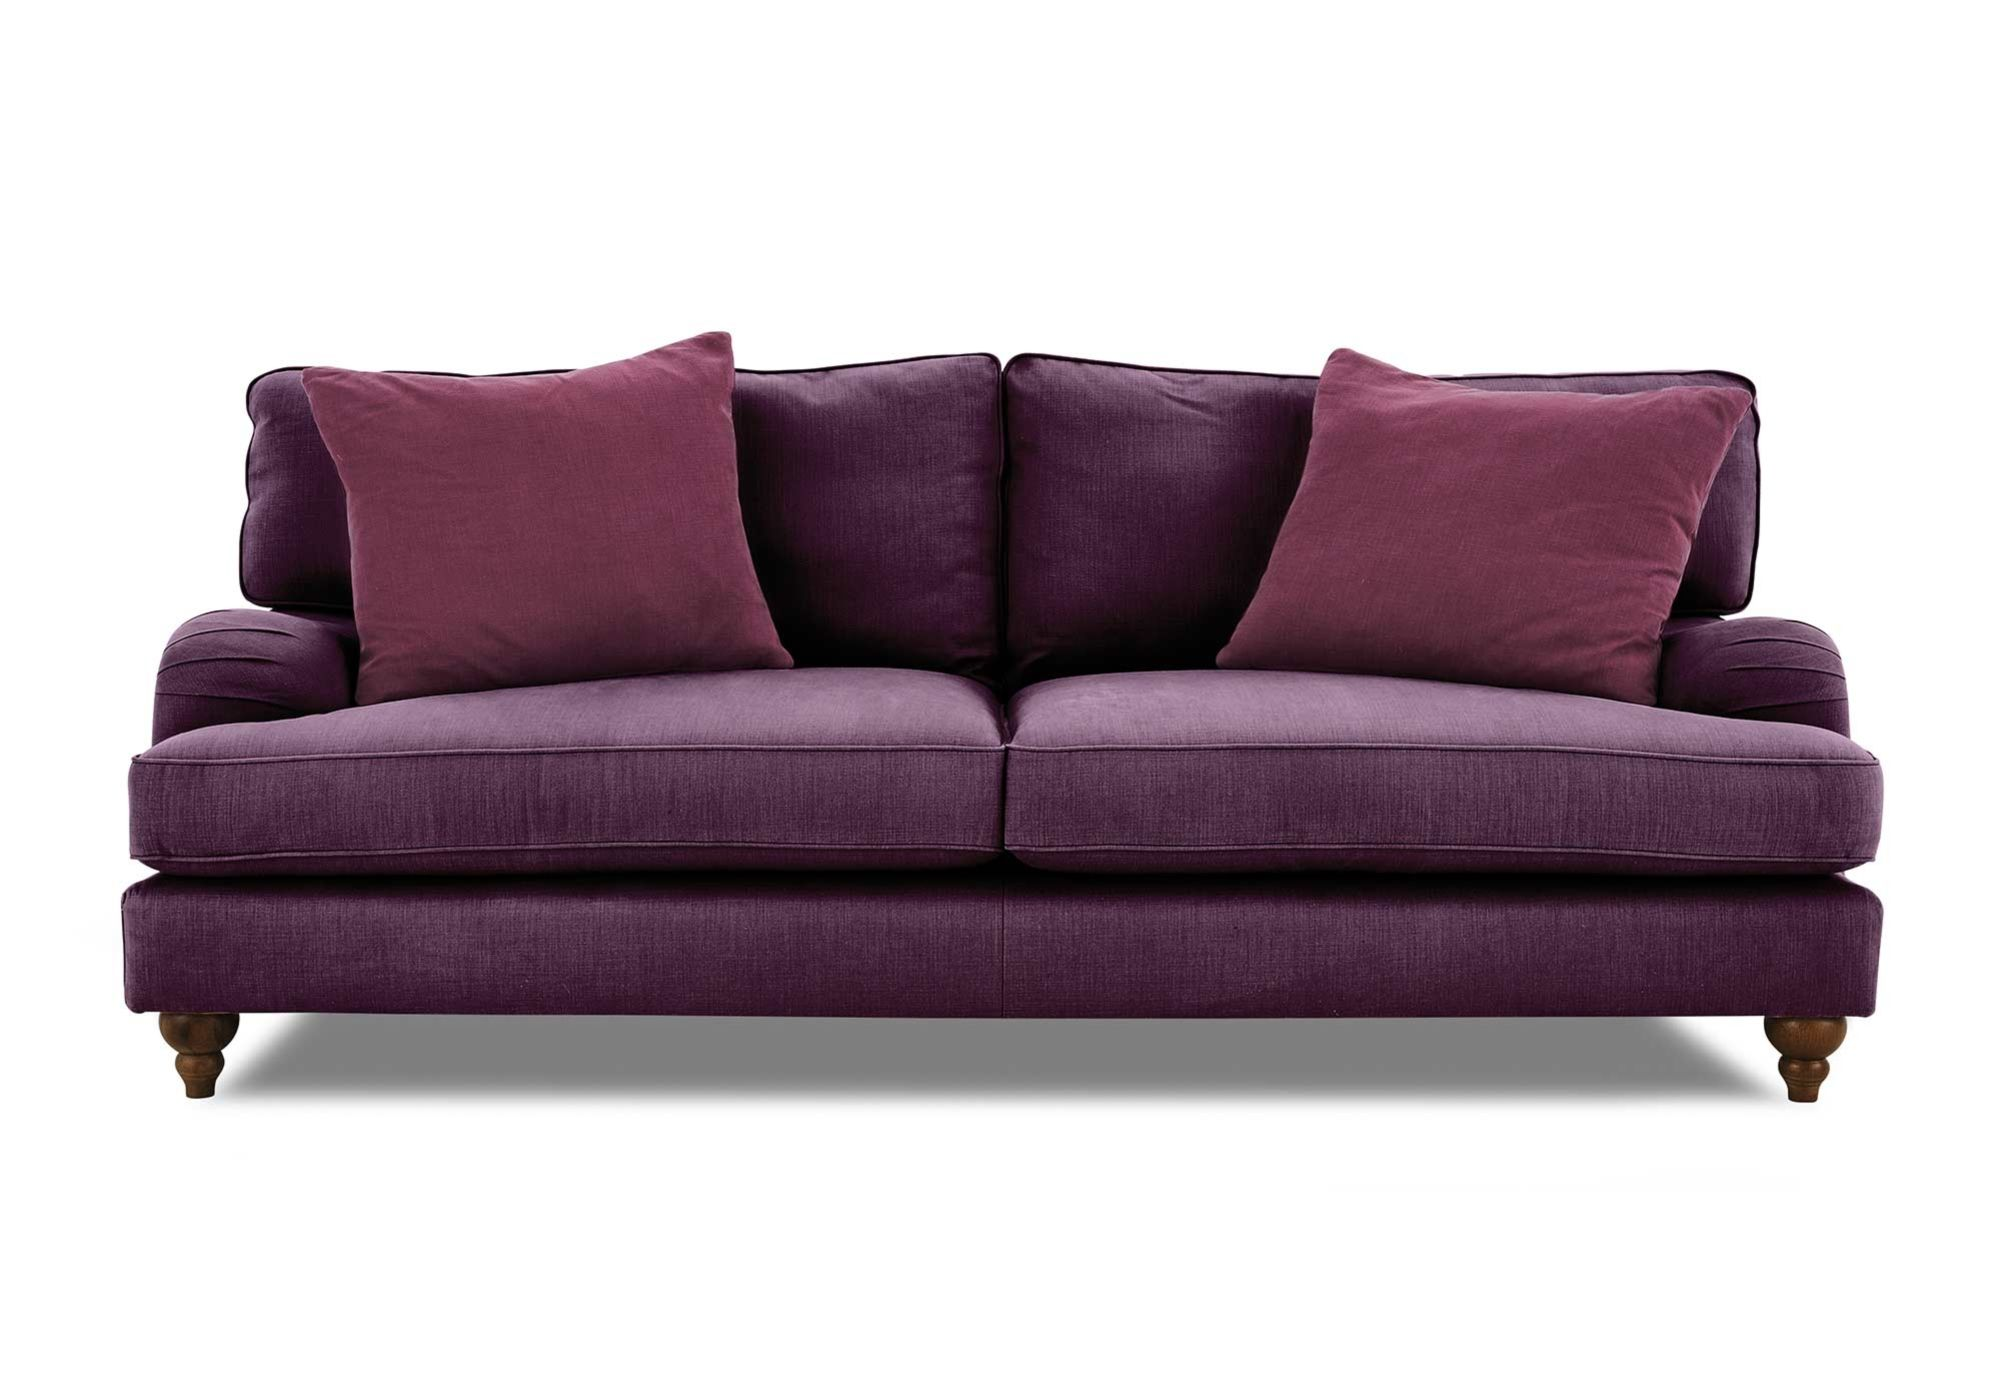 Pizzazz 3 Seater Sofa Revive